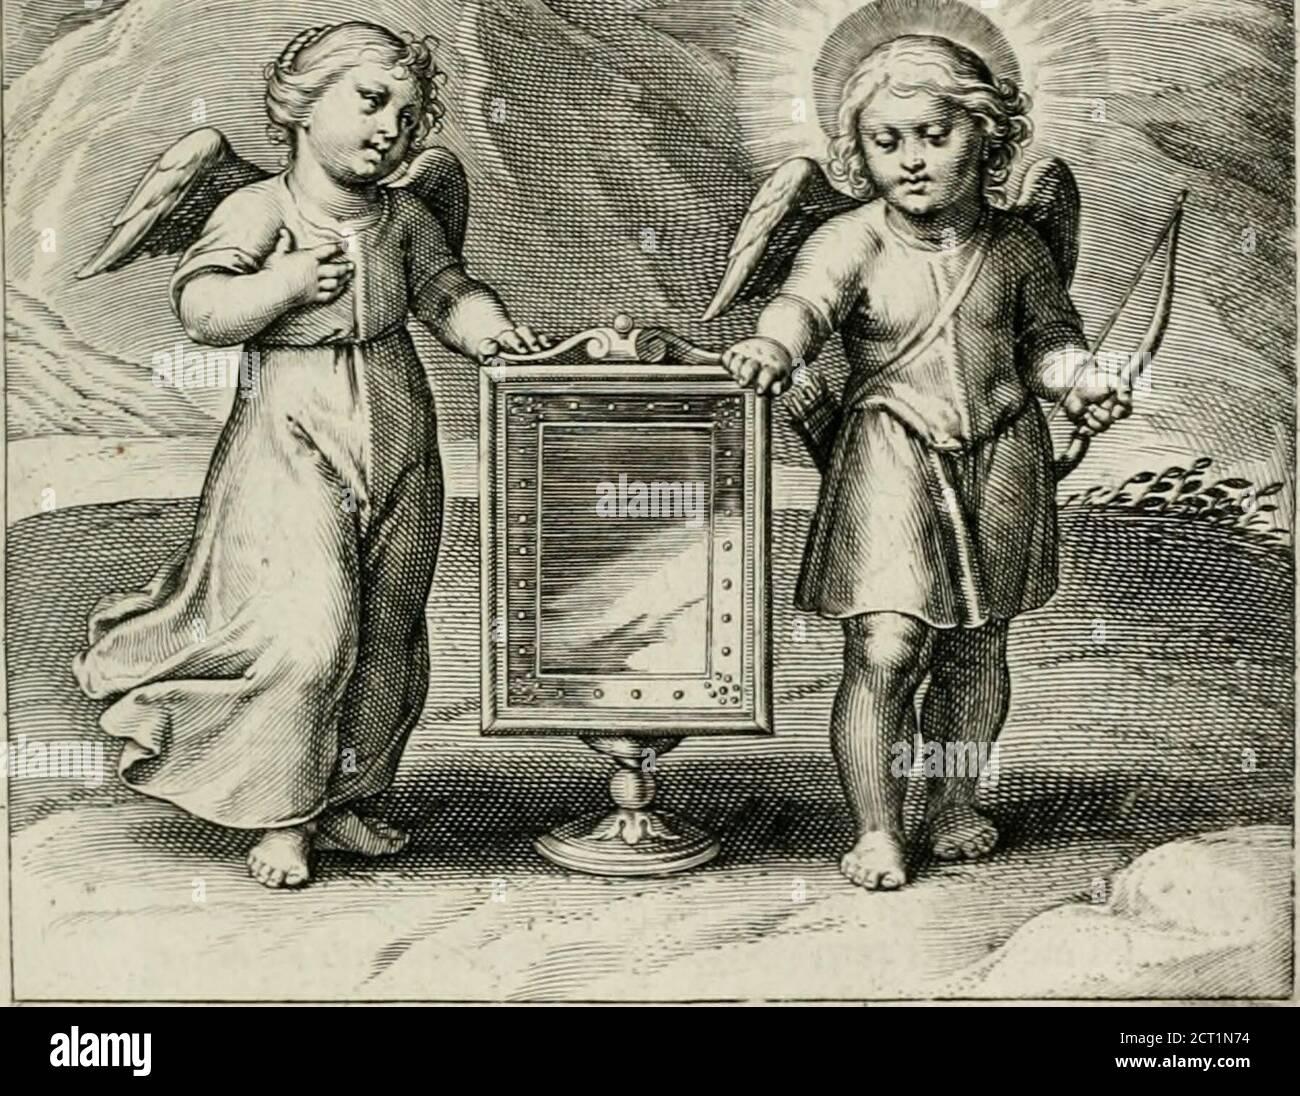 . Amoris divini emblemata . ndum crea in me Deus,&: Fpiricum redumminnoua in vifceribus meis. Pulchraes amica mea, & mácula non eft in te. Si Deo aliquid diligendo vel pnponimiis vel arqua-mus,nos ipfos diligcre nefcimiis. Menos Domine te amat, qui aliquid tecum amar,quod propter te non amat. No. 4. Aufl. En Idem iaConfejf. ES Amor vn claro efpejo.en cuyo limpio cri Halse vè Dios al natural. GElijck cen fpieghel fchoon en klaer i Ç tiiroir iia plus degrxceMoet de verliefde fíele wefen, 1 vj pour eílrc en vn endroiñt, loet de verliefde fíele wefen,Gantfch fonder vleck,en dat-daermen Foto de stock